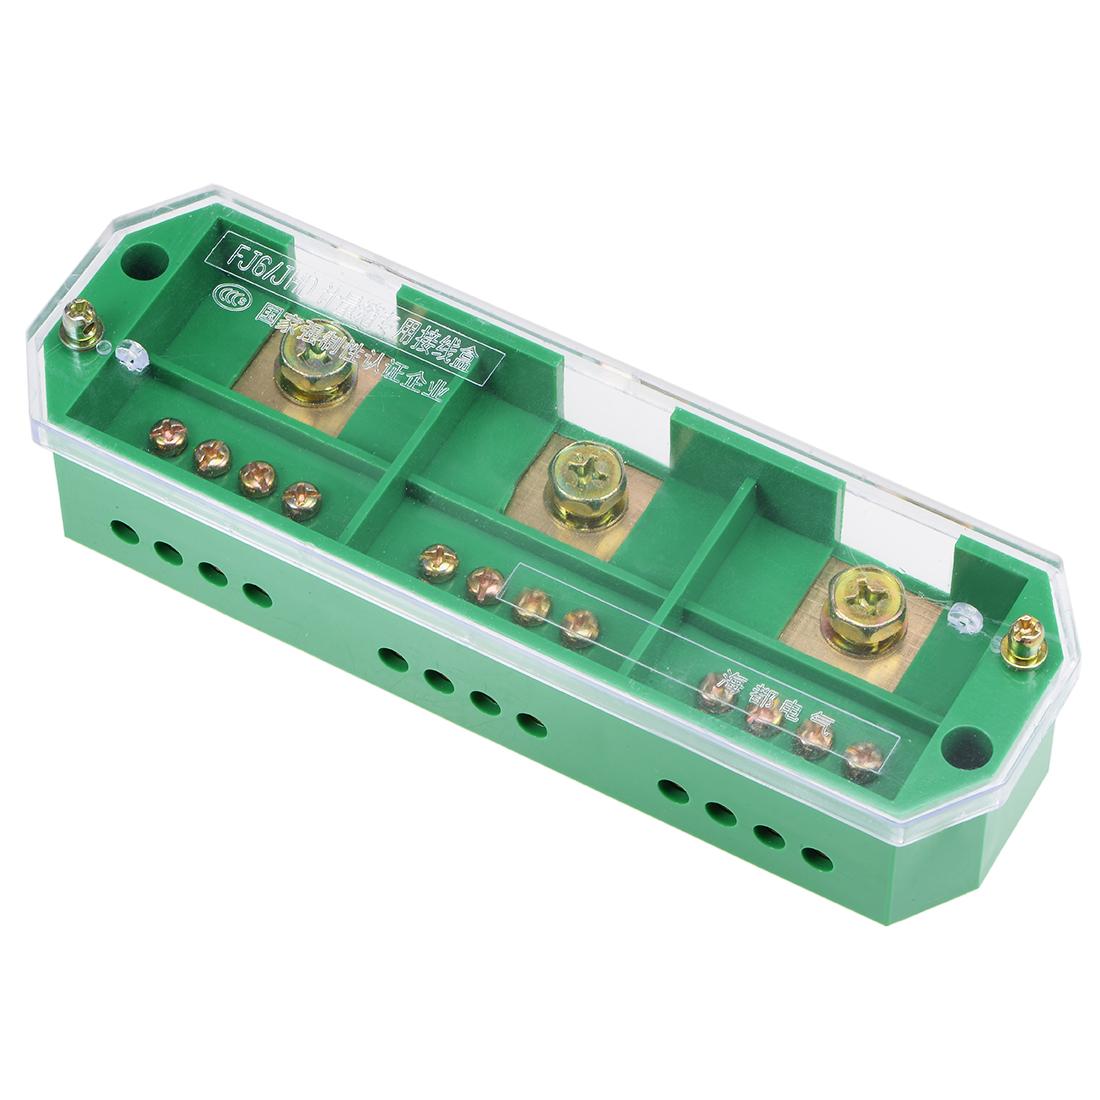 3 Inlet 12 Outlet Terminal Strip Blocks Single Phase Distribution Block